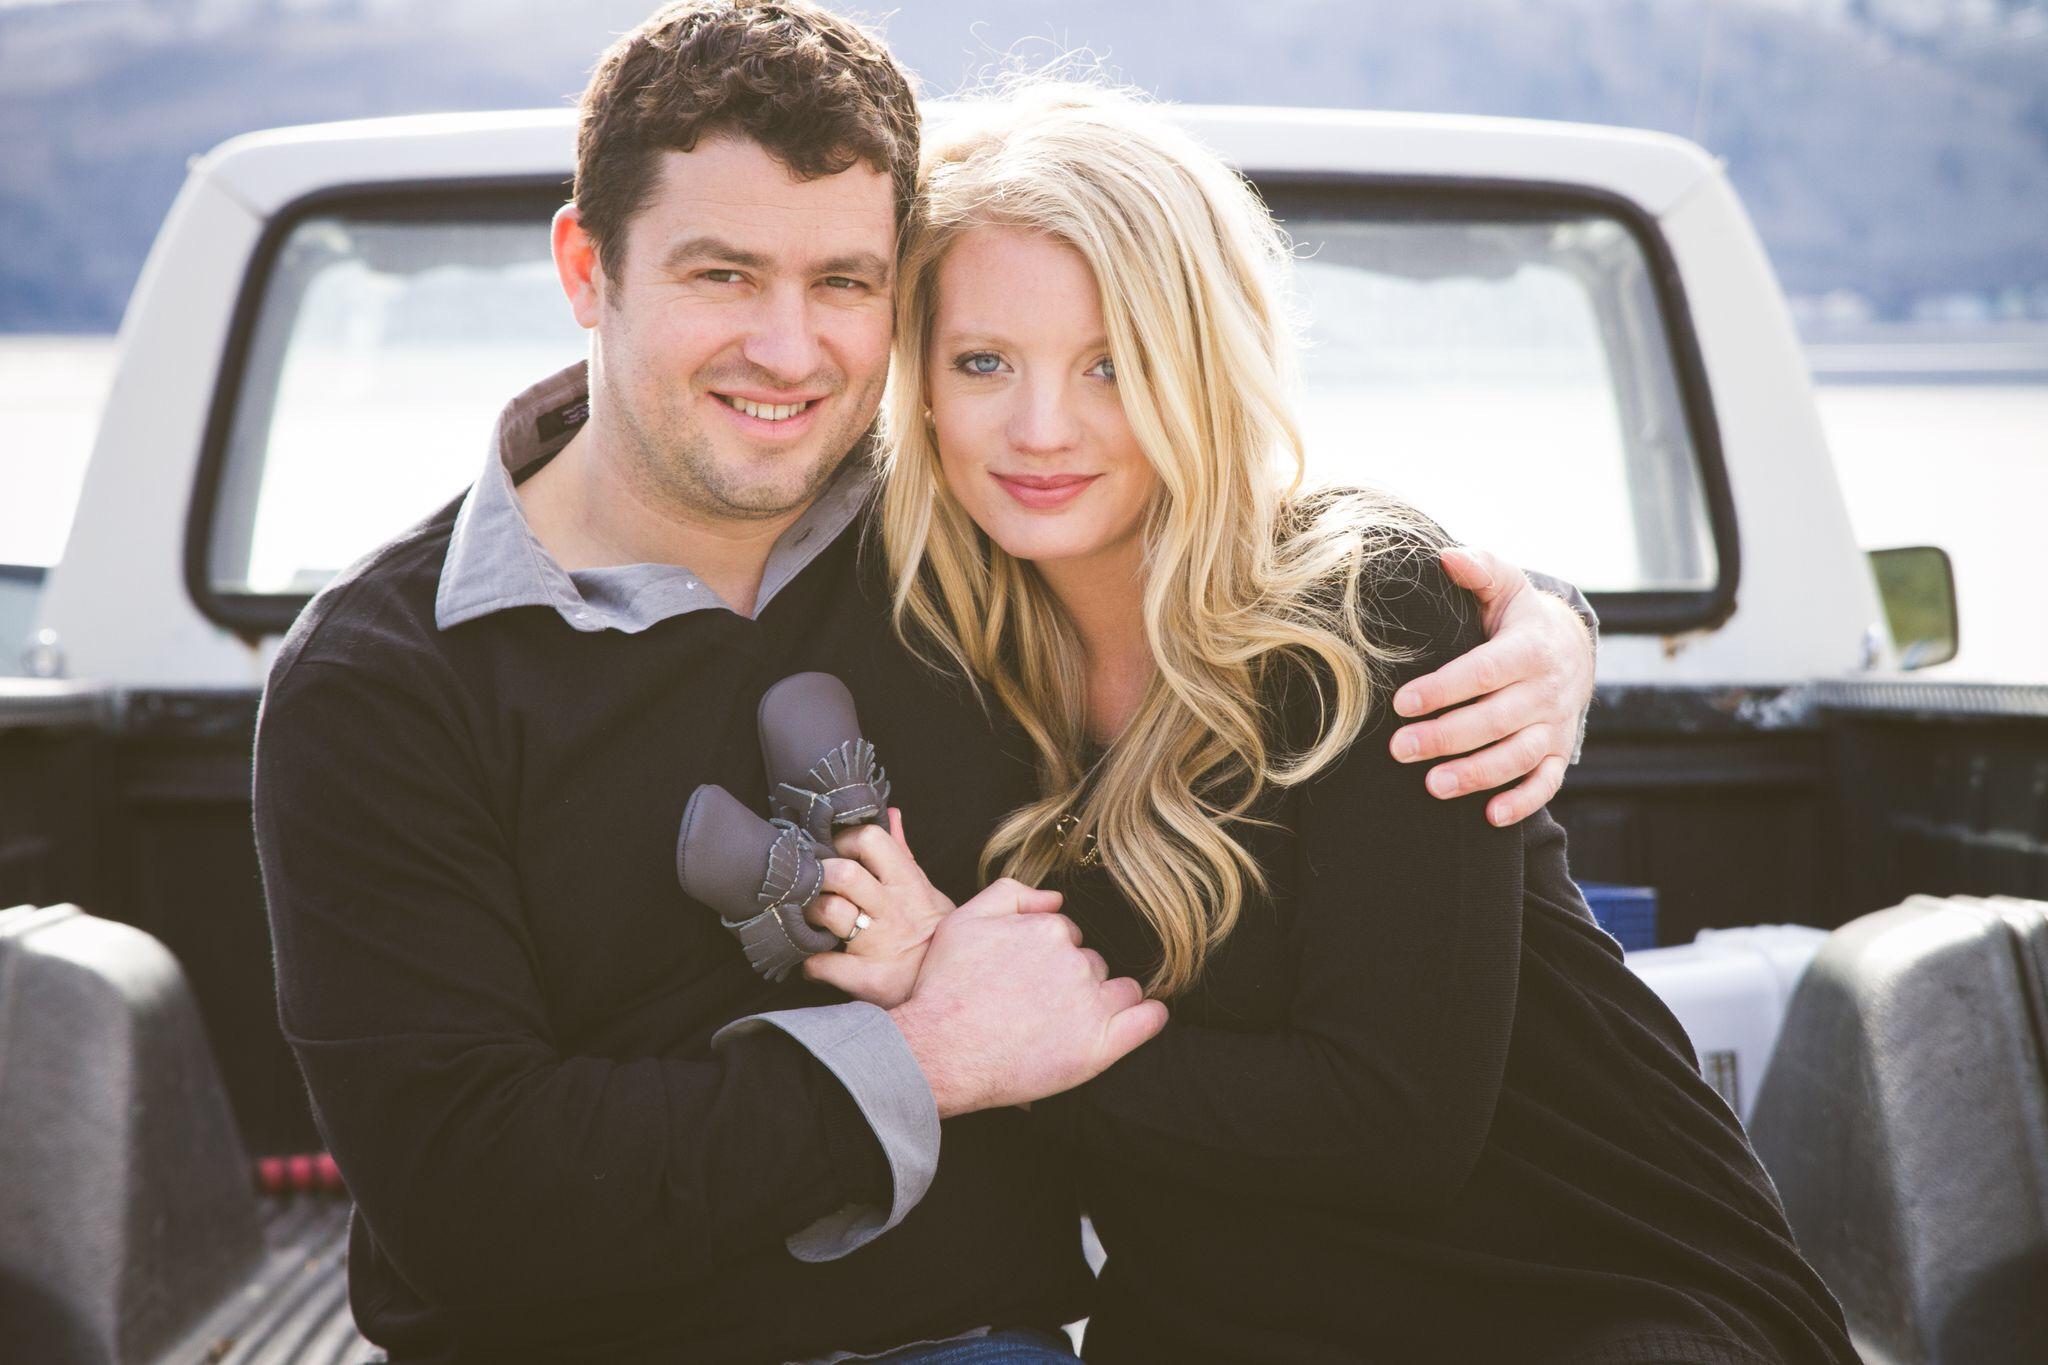 Pregnancy Anouncment | The Winemakers Wife